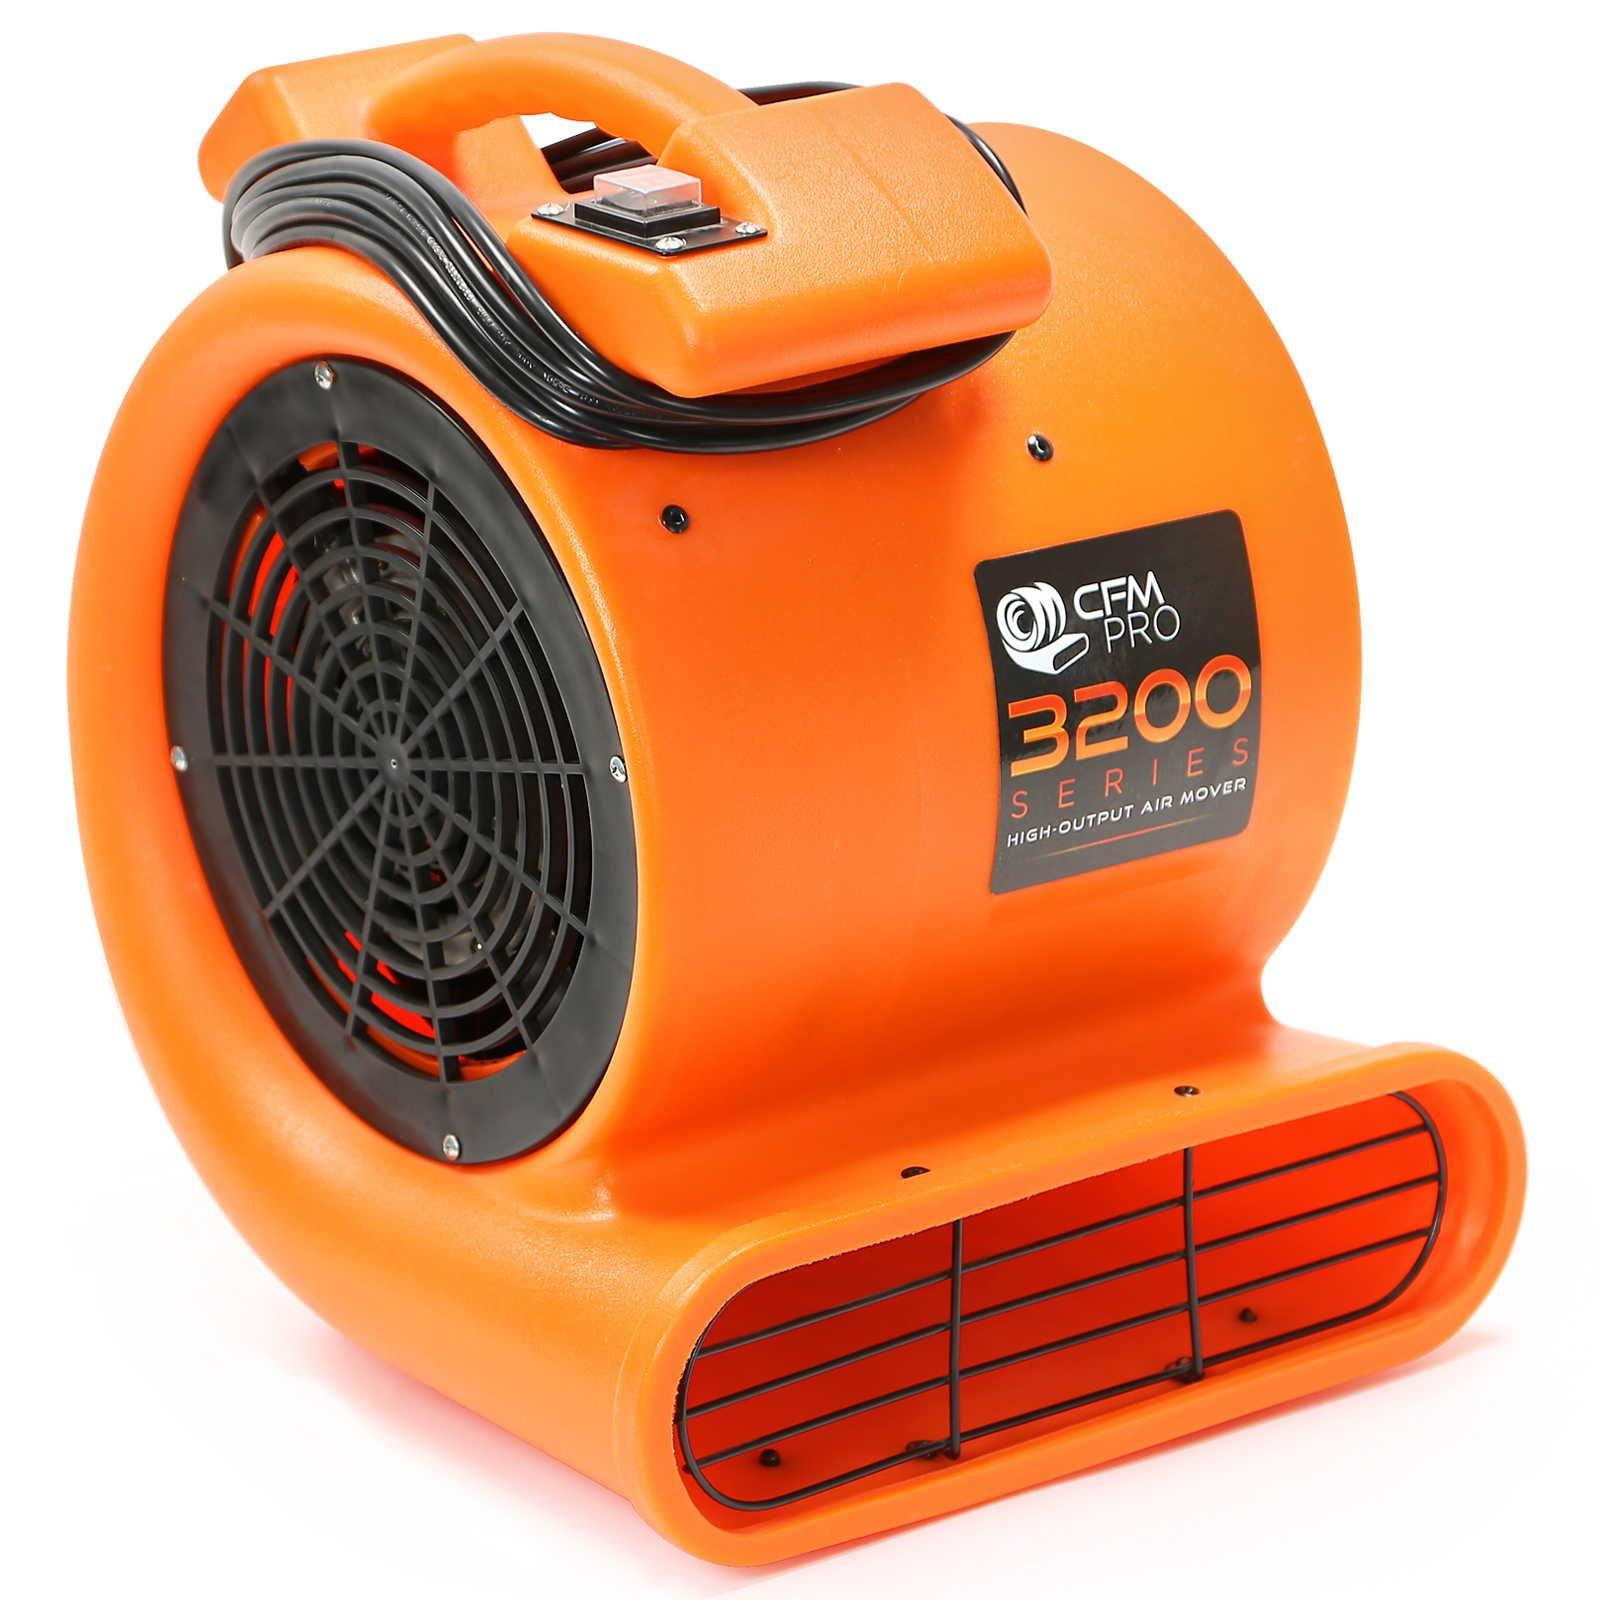 CFM Pro Air Mover Carpet Floor Dryer 2 Speed 1/2 HP Blower Fan - Orange - Industrial Water Flood Damage Restoration by CFM Pro (Image #1)